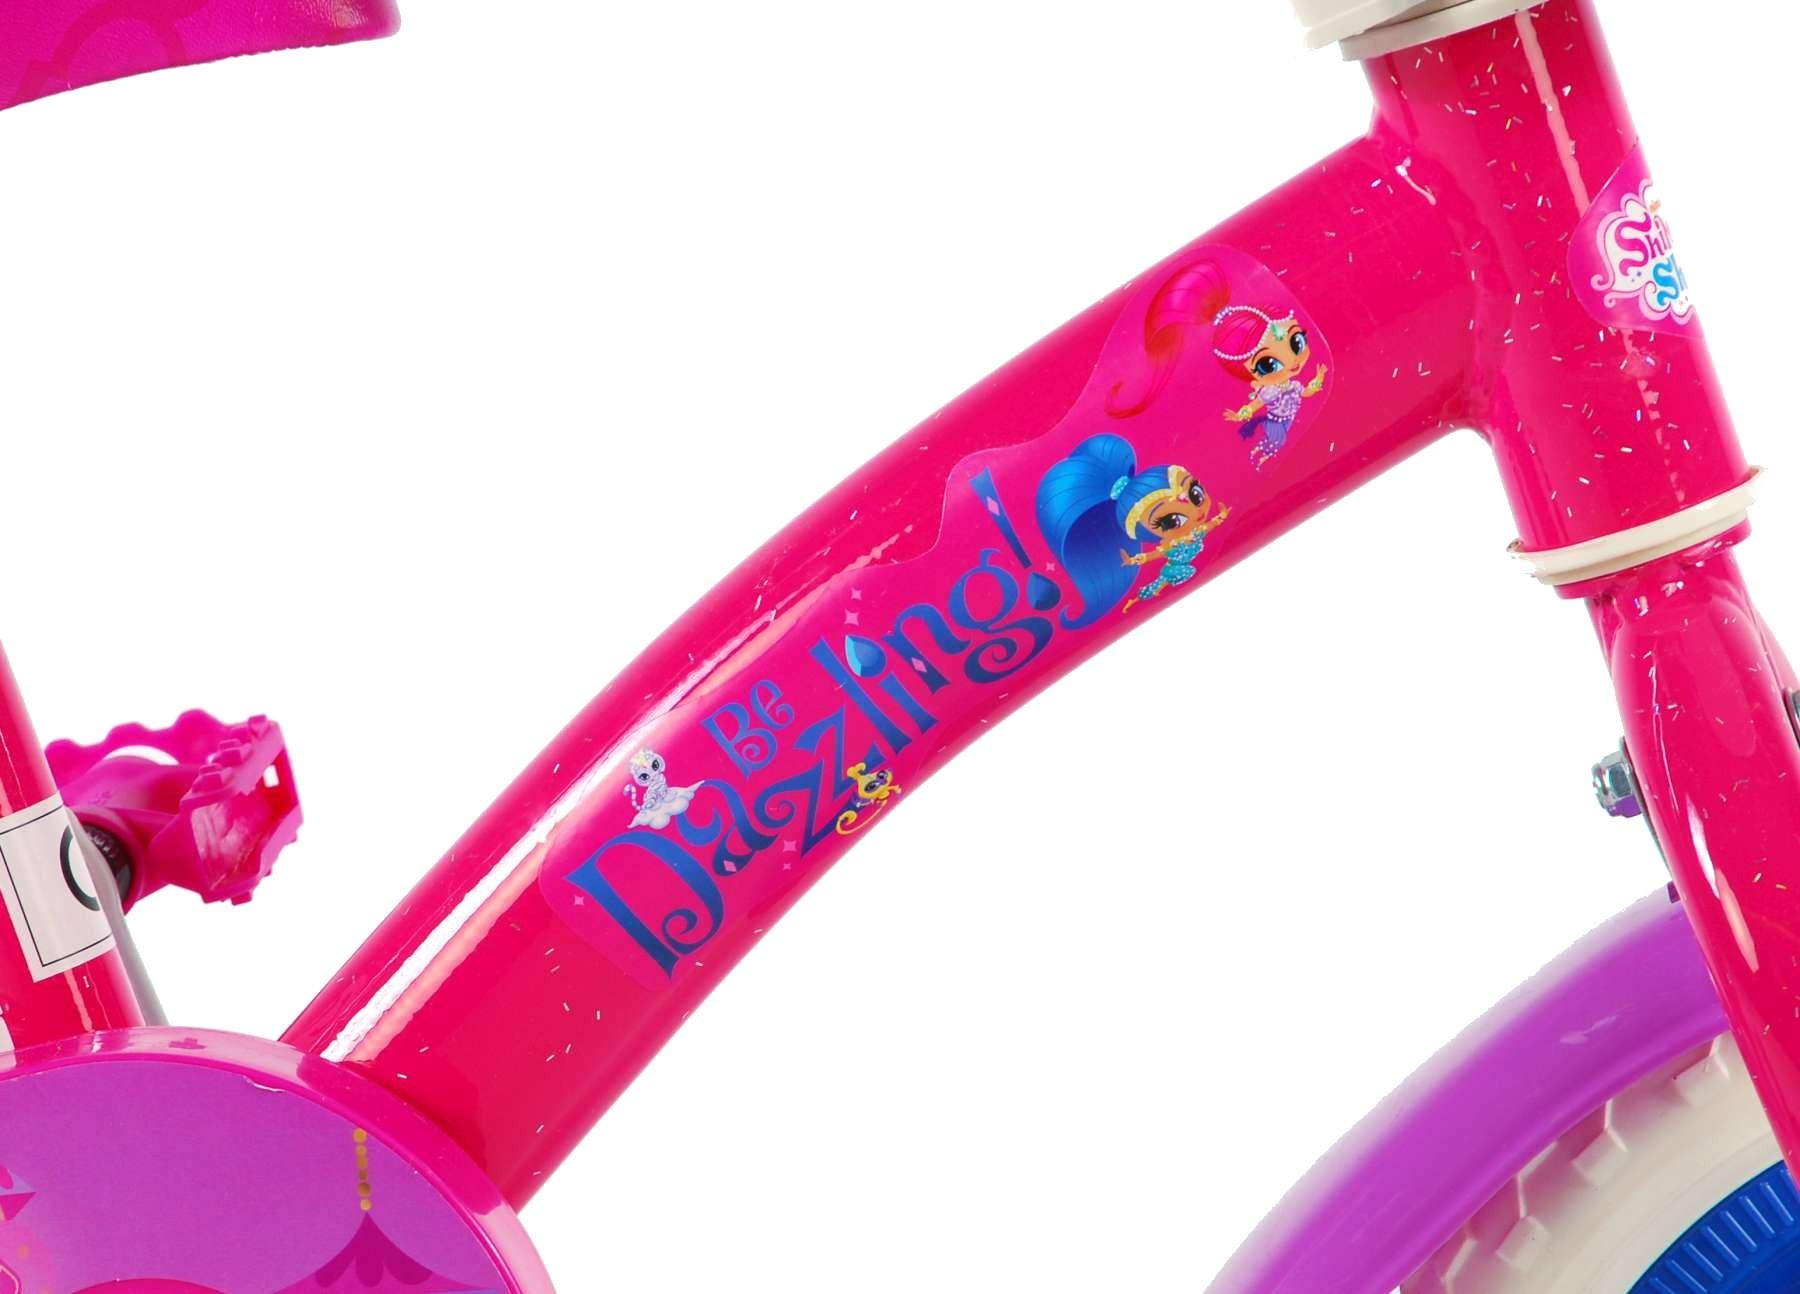 Volare Shimmer Shine 10 Inch Meisjes Doortrapper Rozepaars Giga